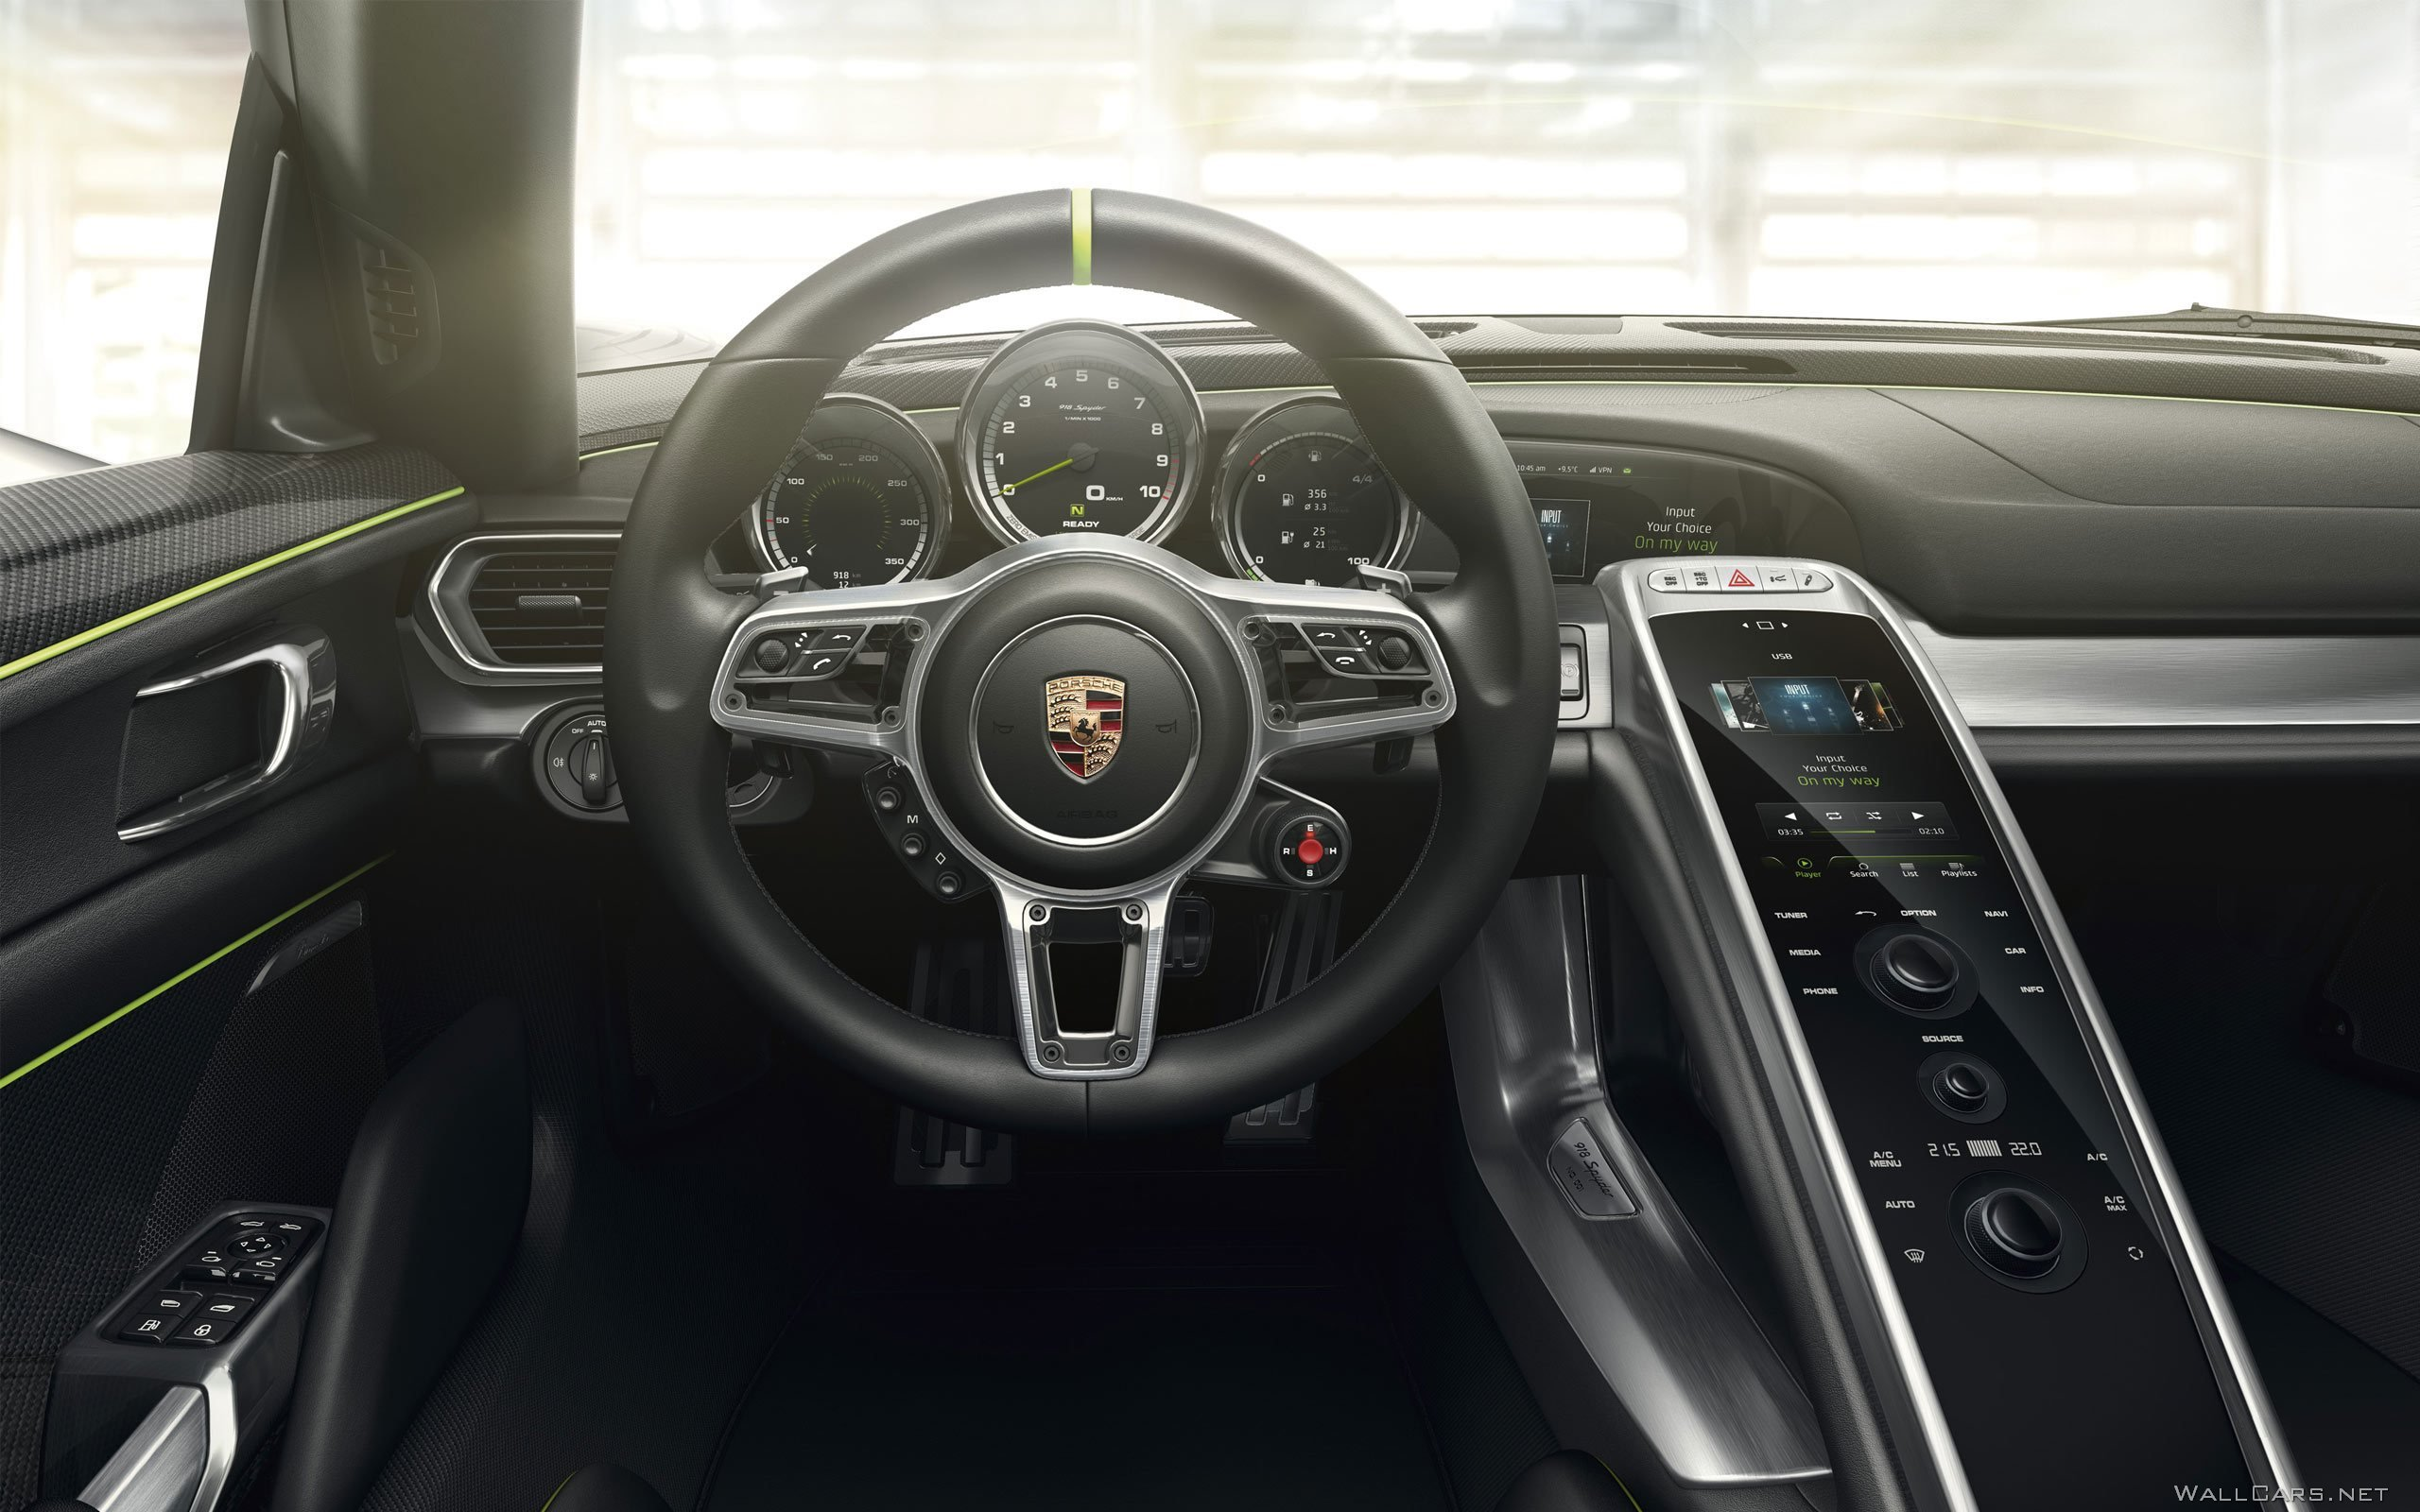 Porsche значок, бесплатные фото, обои ...: pictures11.ru/porsche-znachok.html